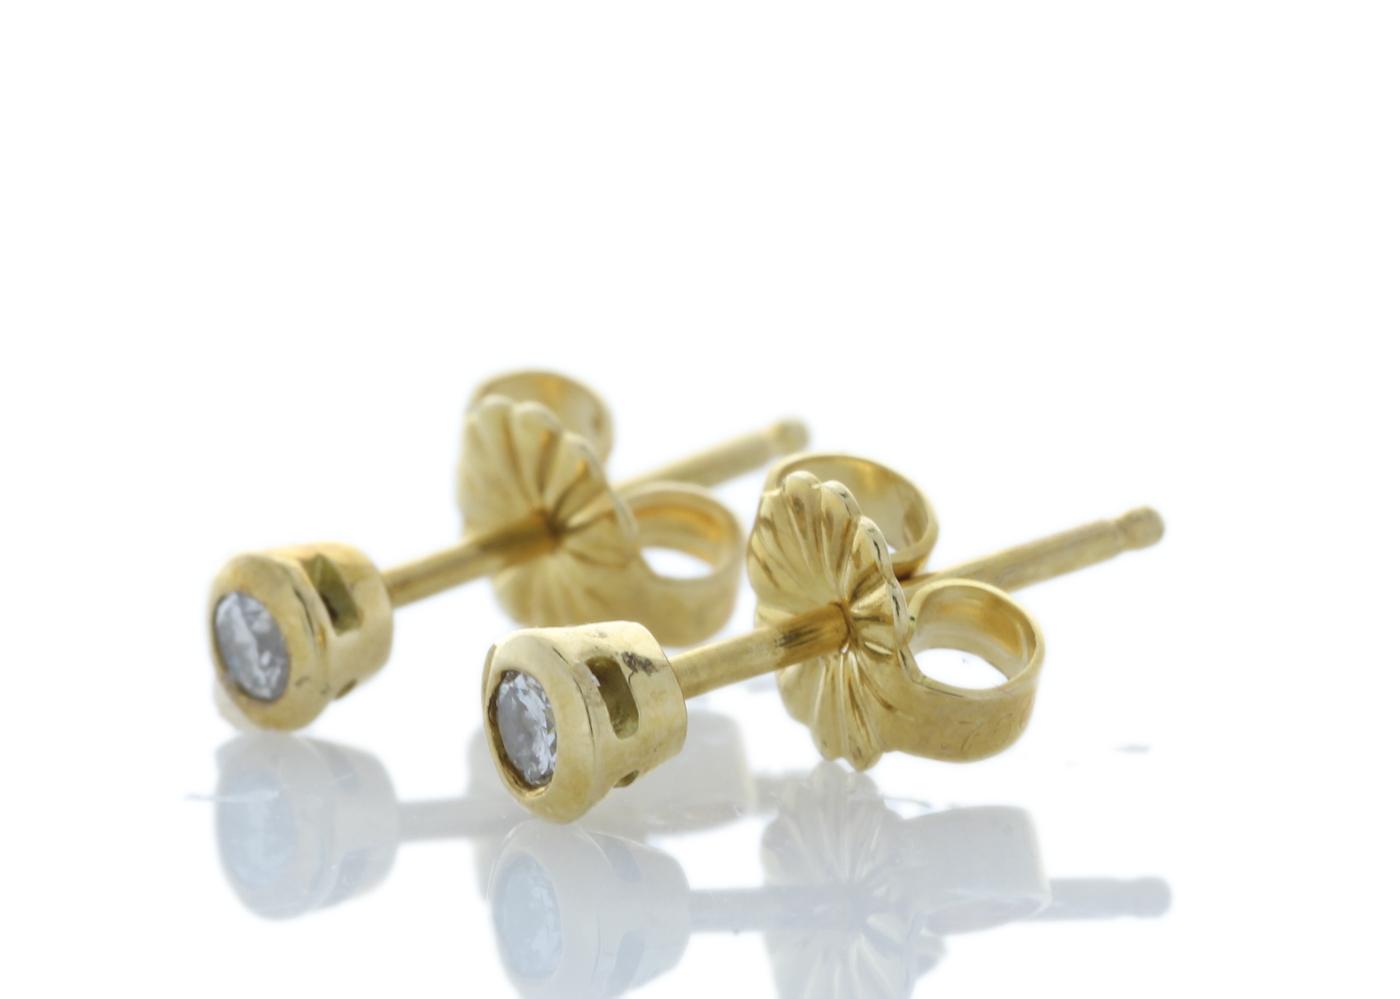 Lot 5 - 18ct Rub Over Set Diamond Earrings 0.10 Carats